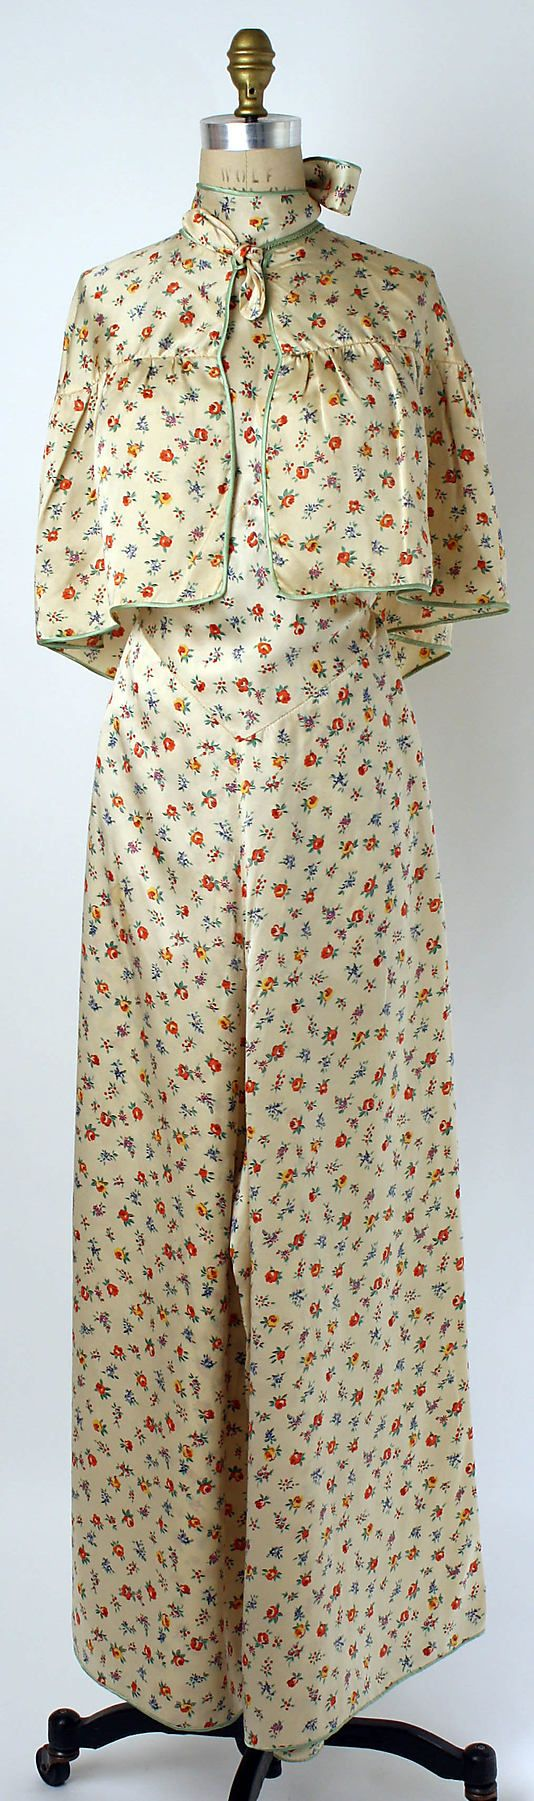 Pajamas Date: 1928 @vintageclothin.com